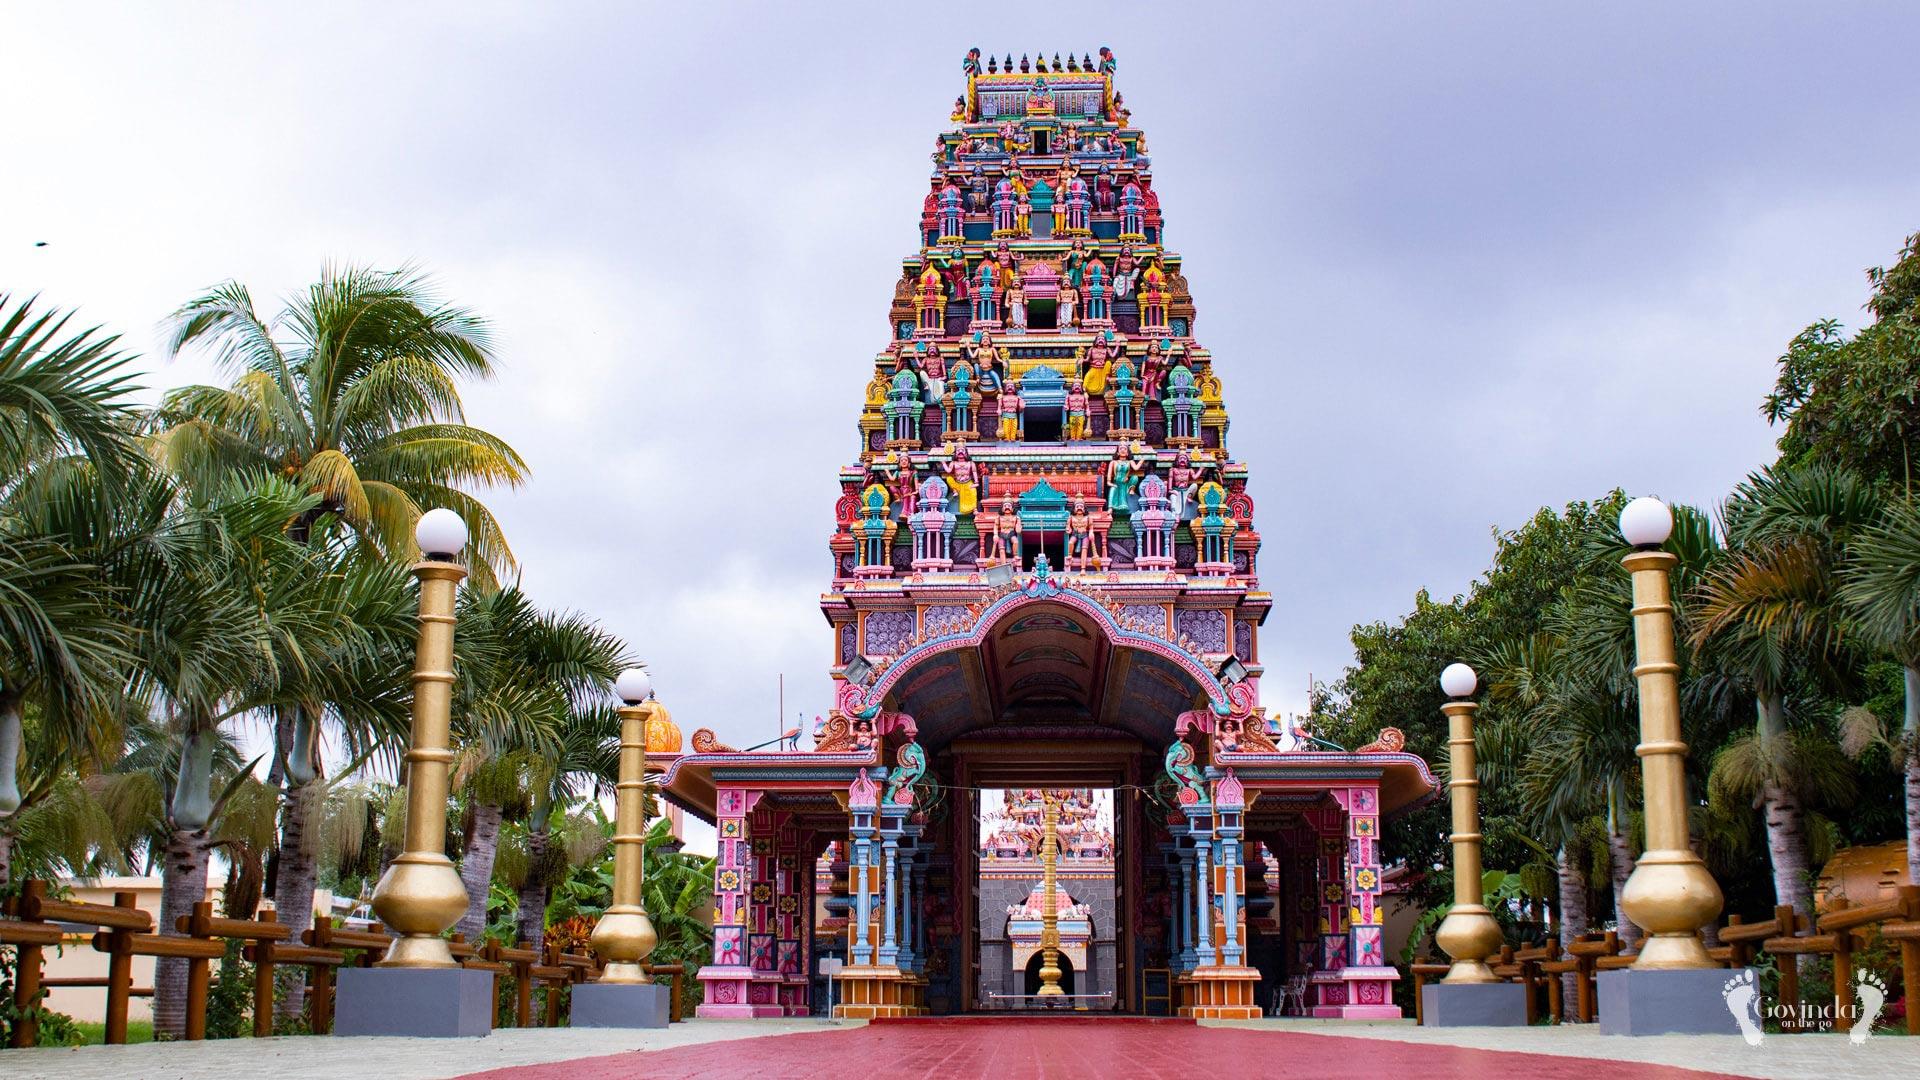 Meenakshi temple in Mauritius